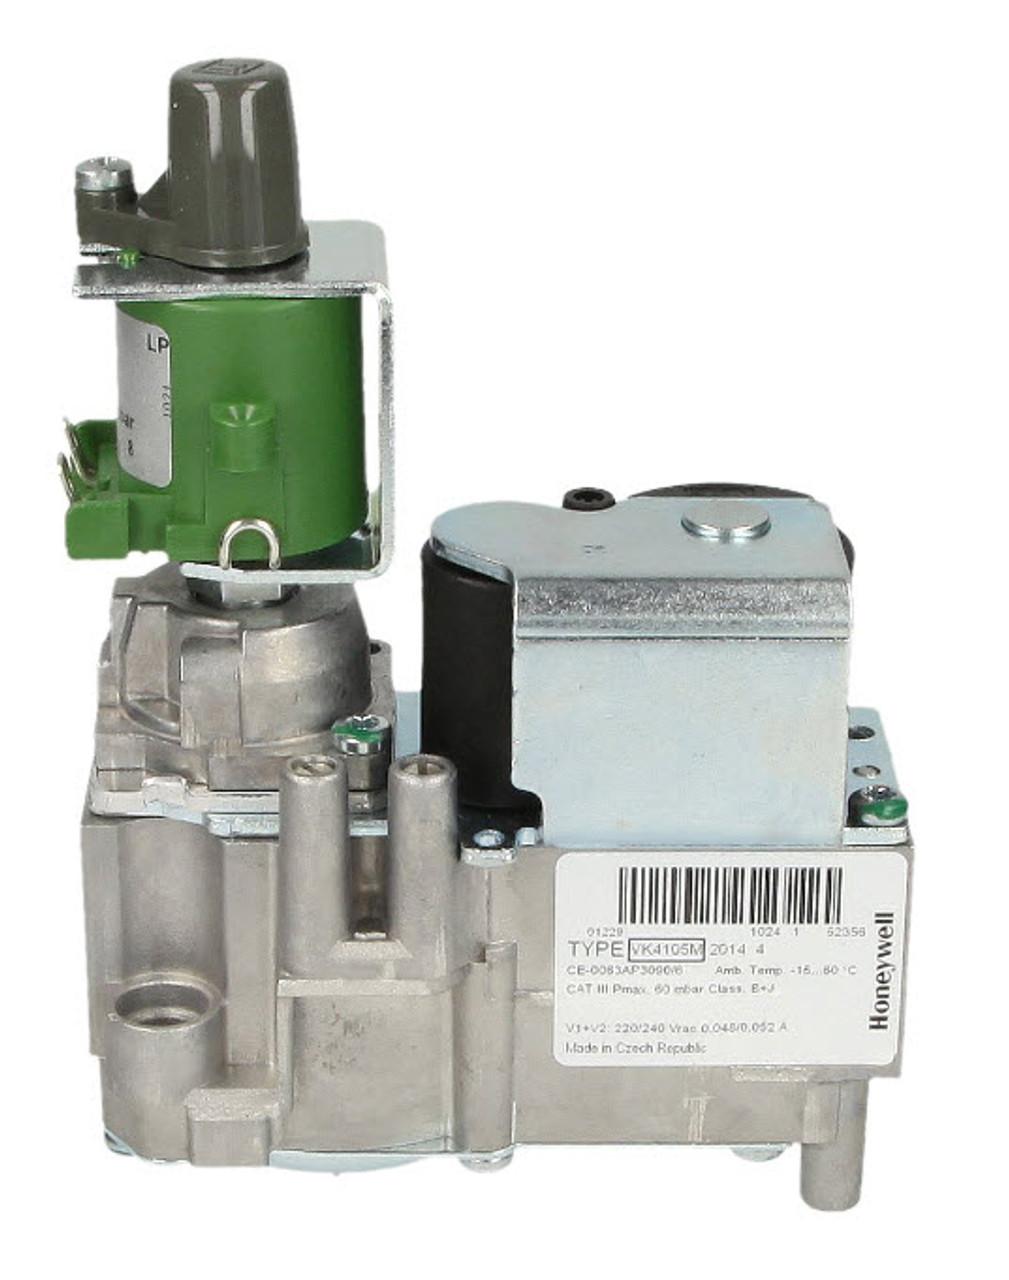 Honeywell VK4105M2014U Gas control block